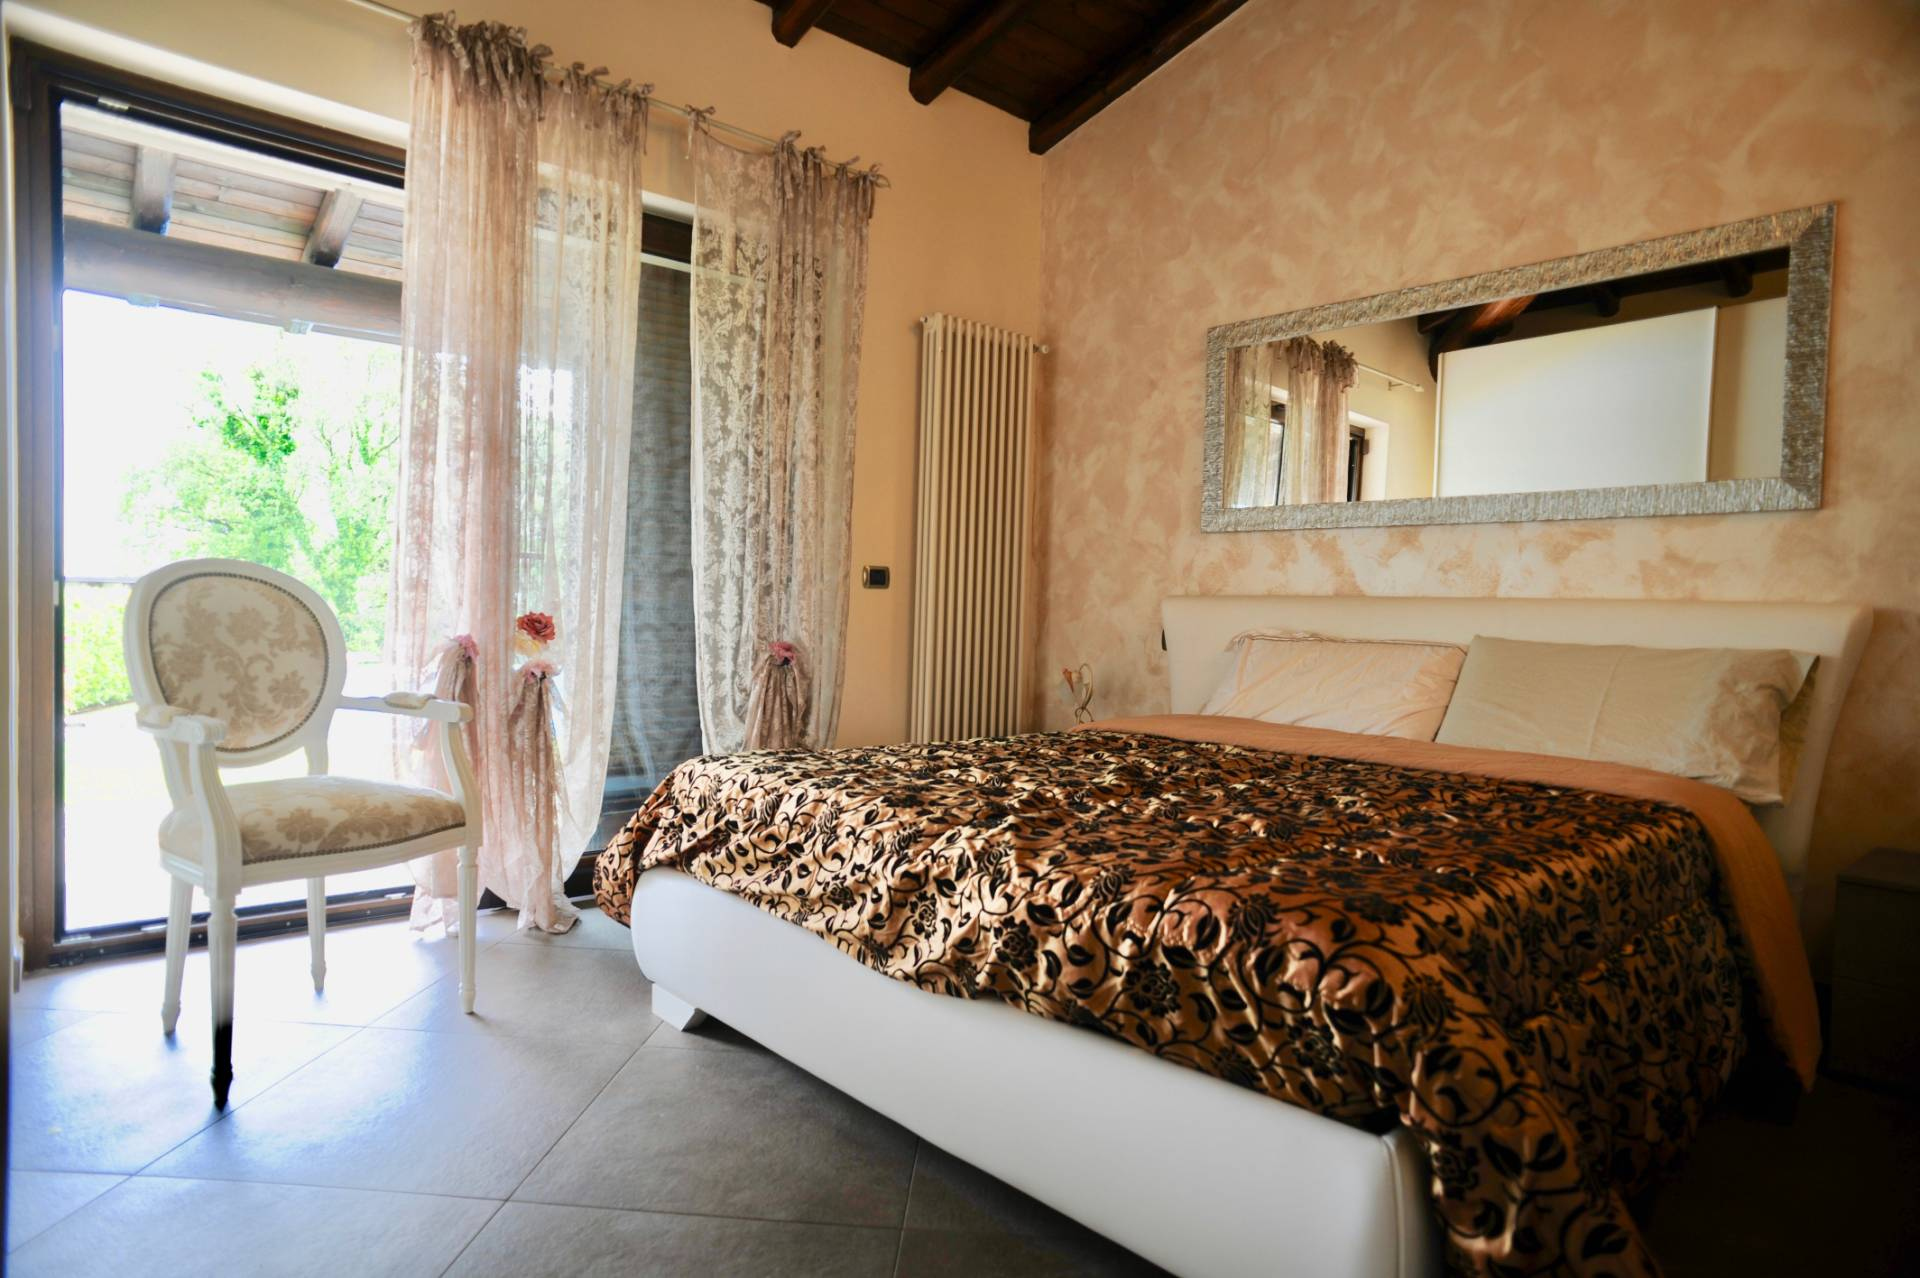 Villa in Vendita a Padenghe Sul Garda: 3 locali, 100 mq - Foto 7